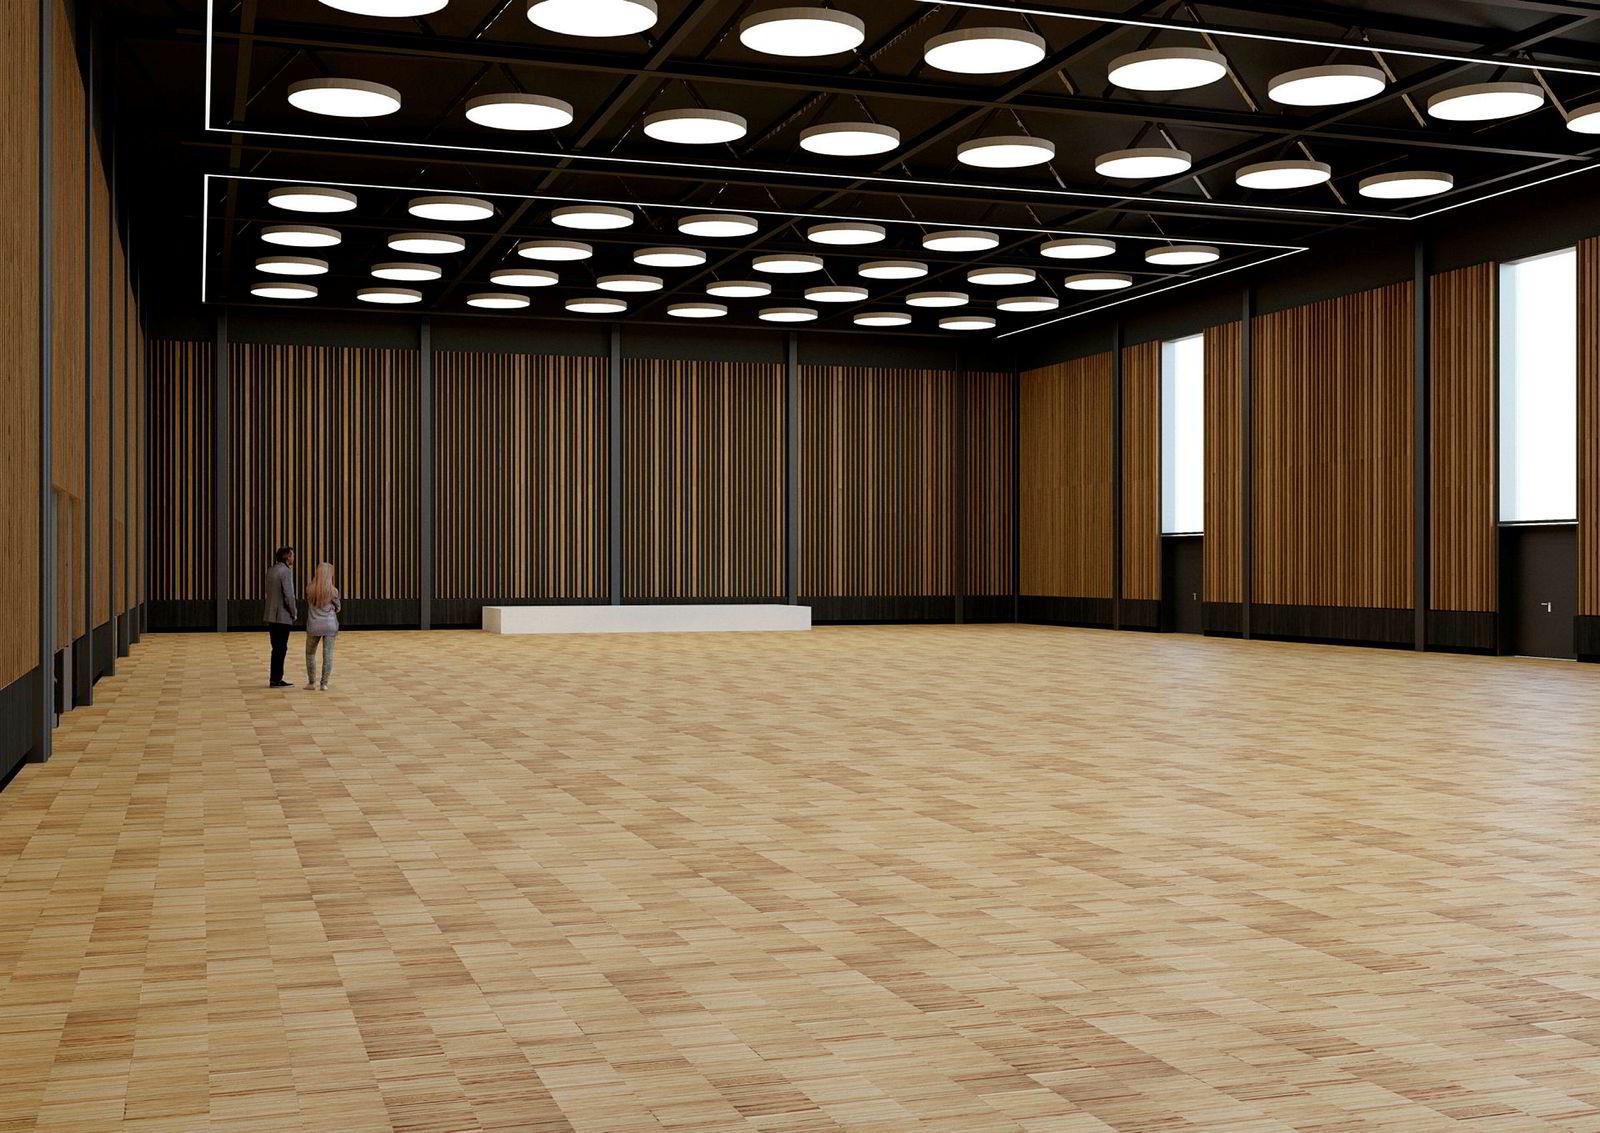 Sundvolden bygger ny kongresshall på 1260 kvadratmeter til 55 millioner kroner.